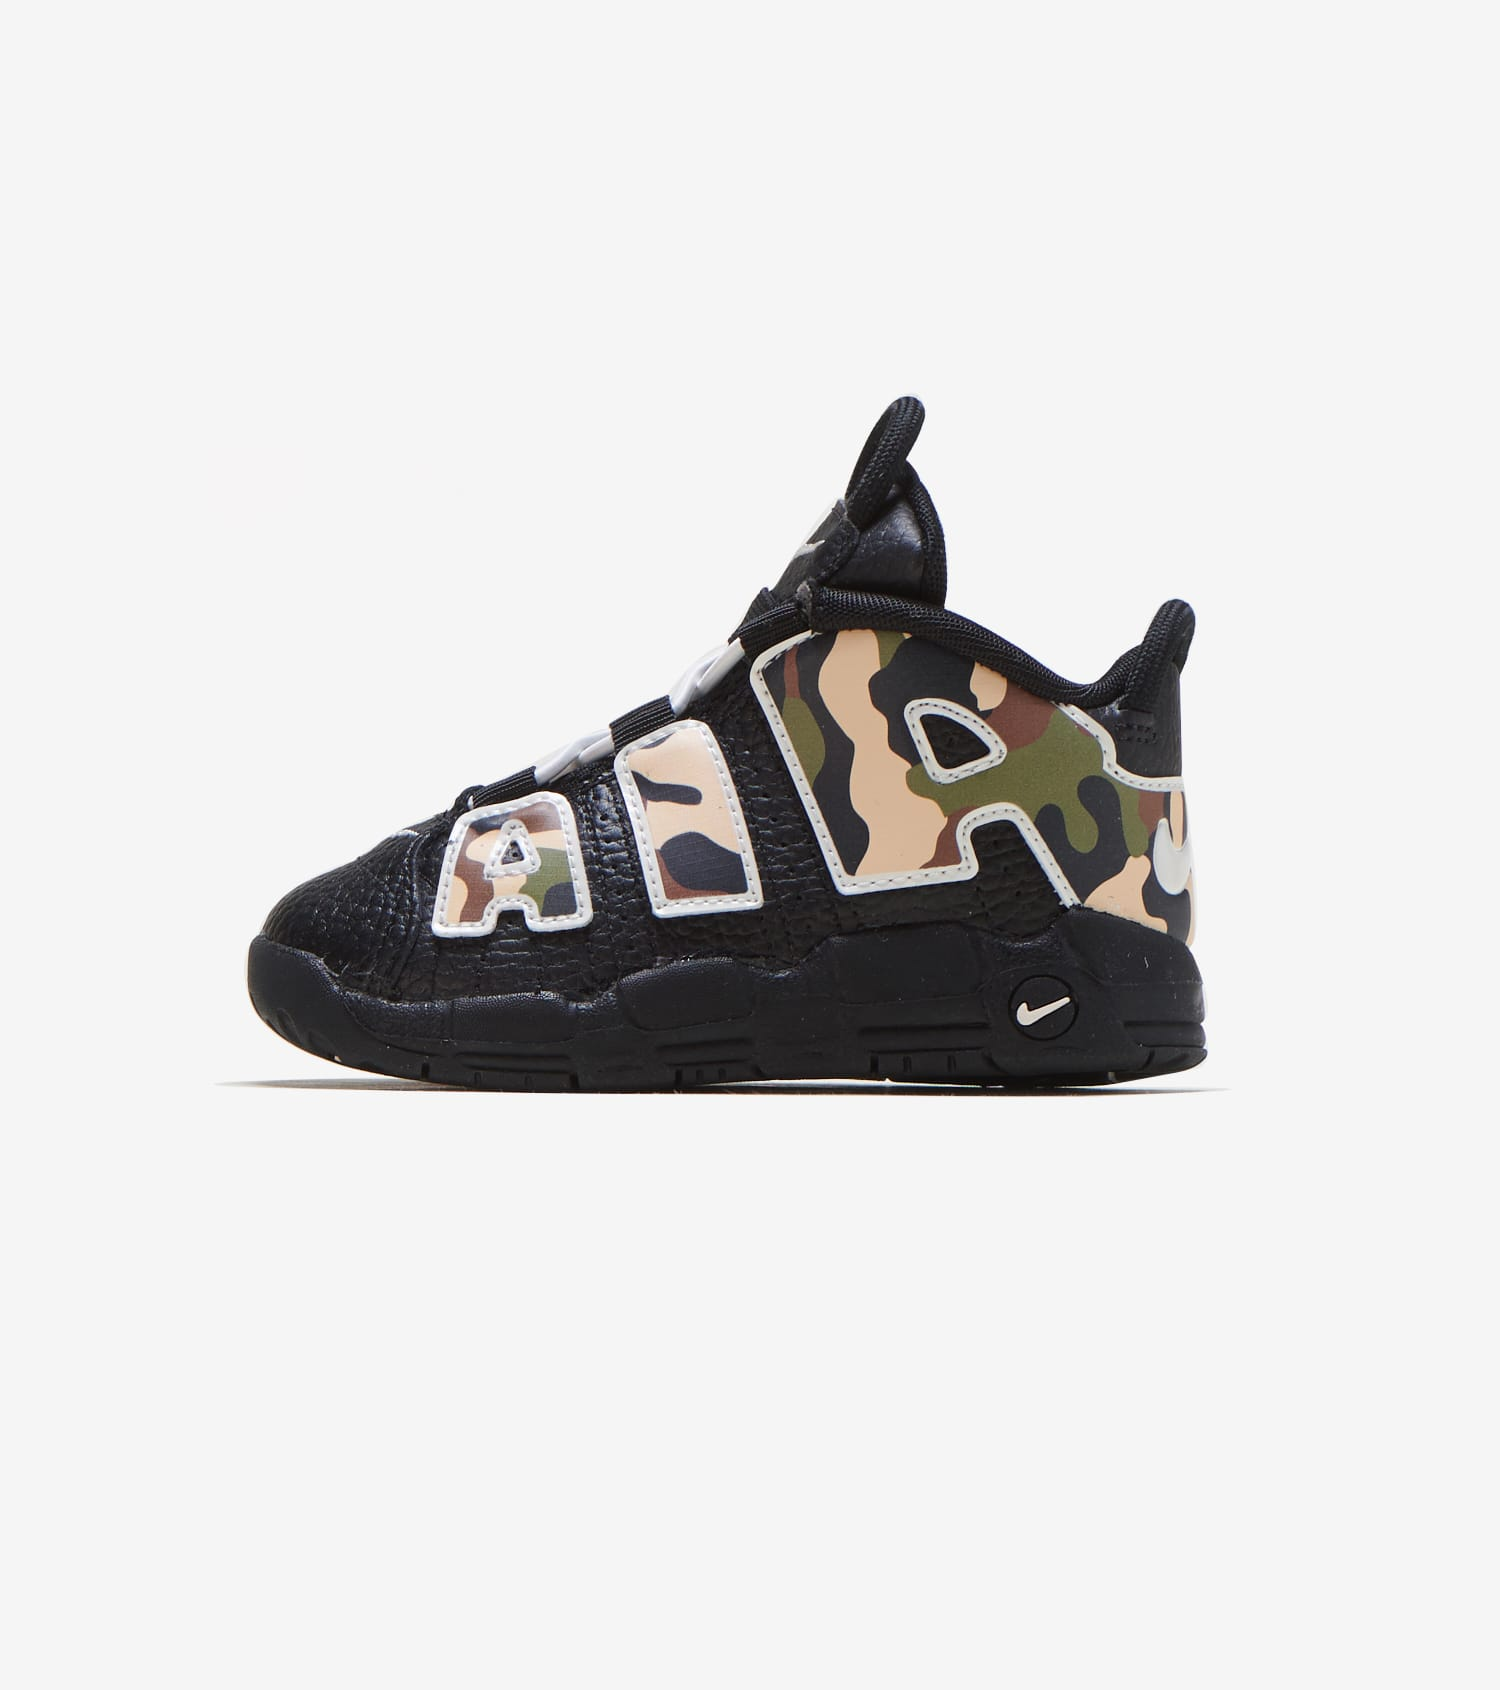 Air Nike More Uptempo black QS shoes strdBhQCx